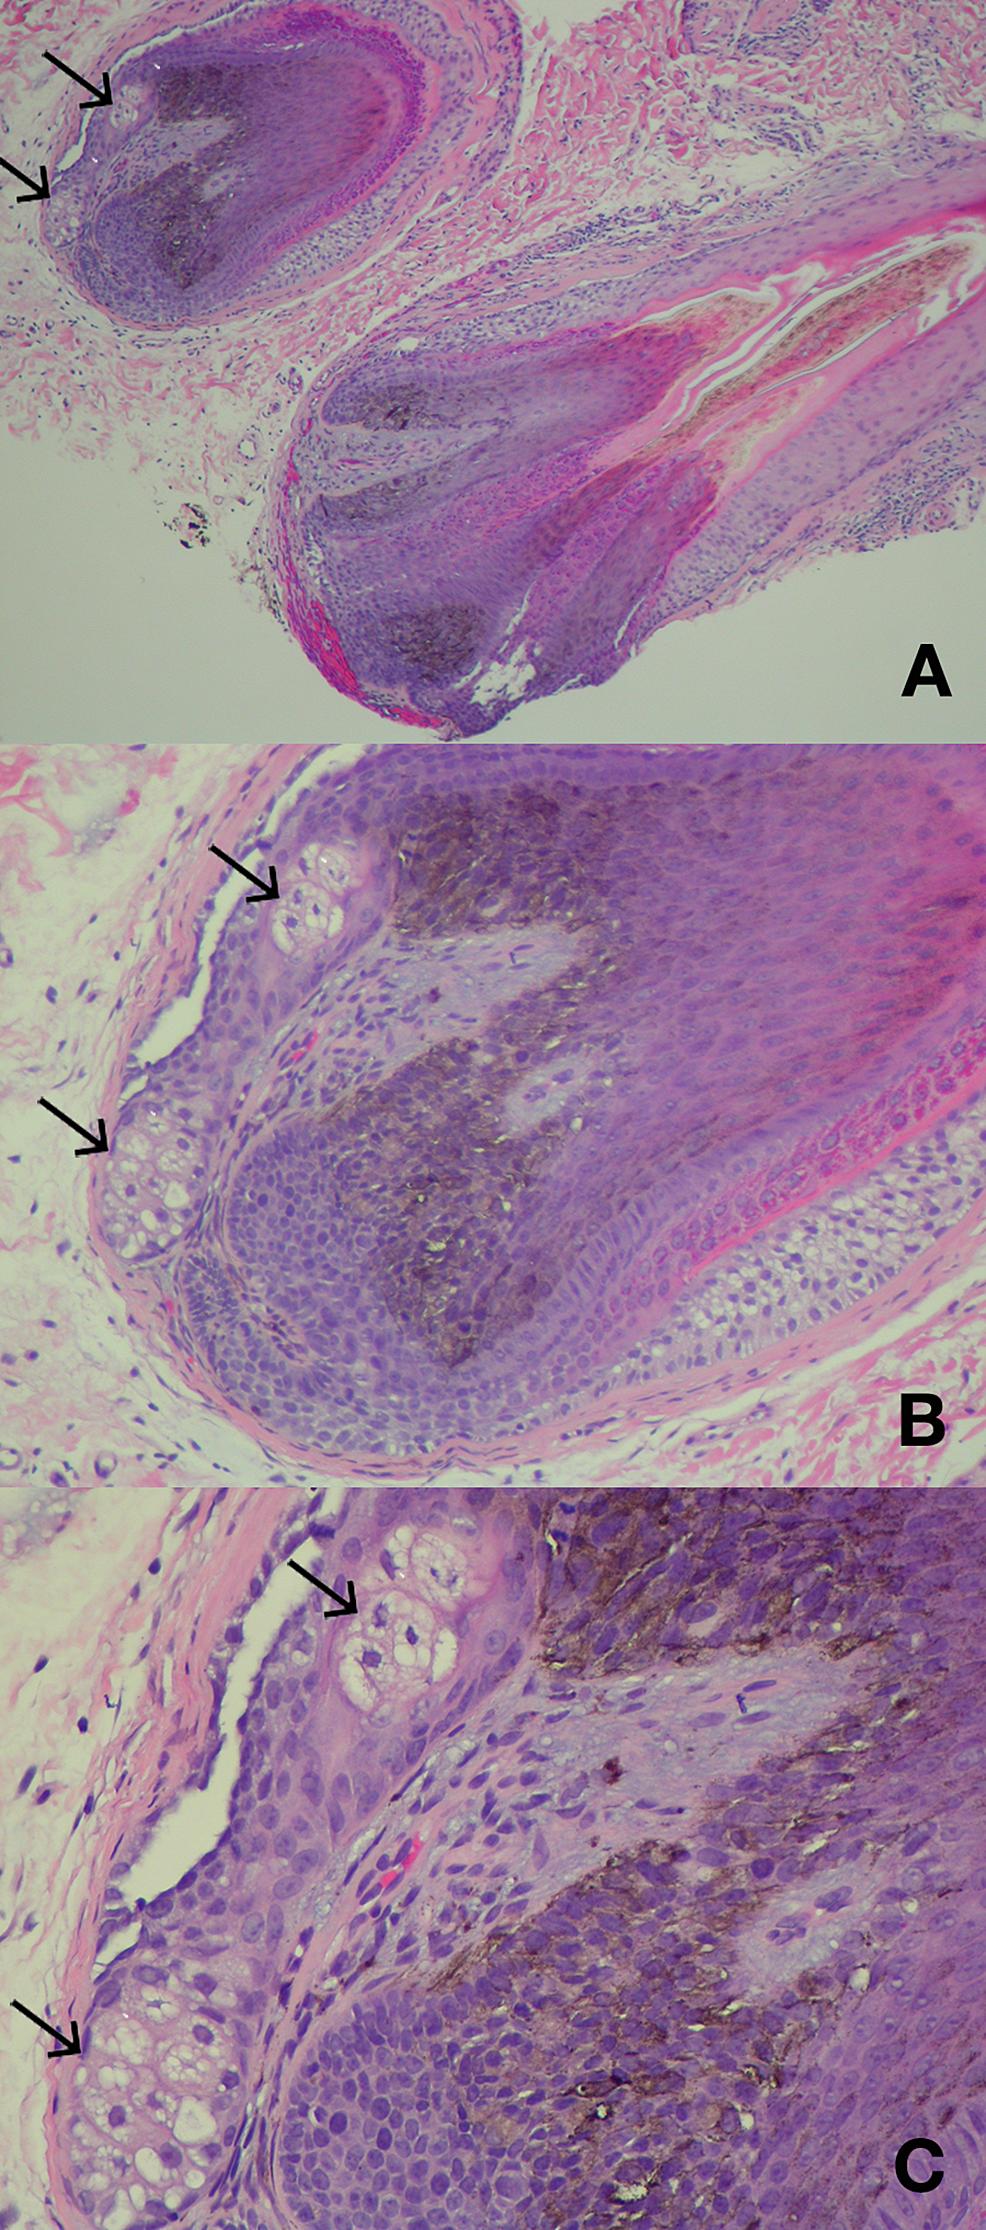 Ectopic-sebaceous-glands-in-hair-papilla.-